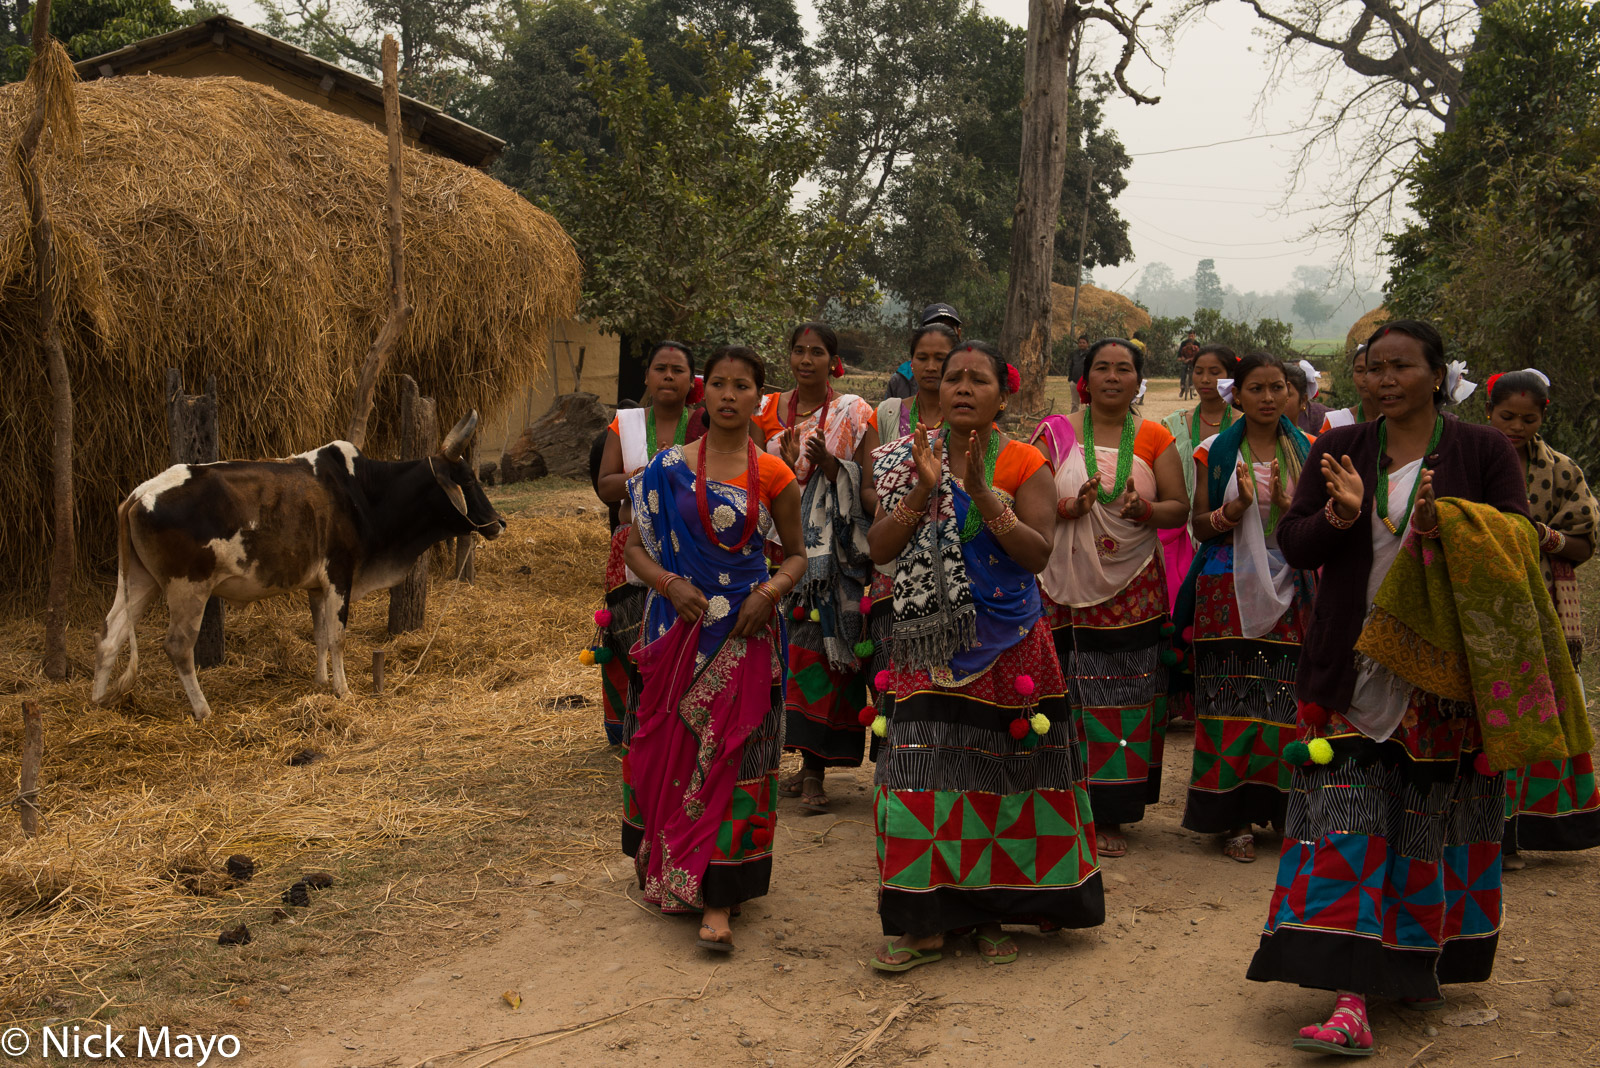 Cow, Nepal, Terai, Tharu, photo